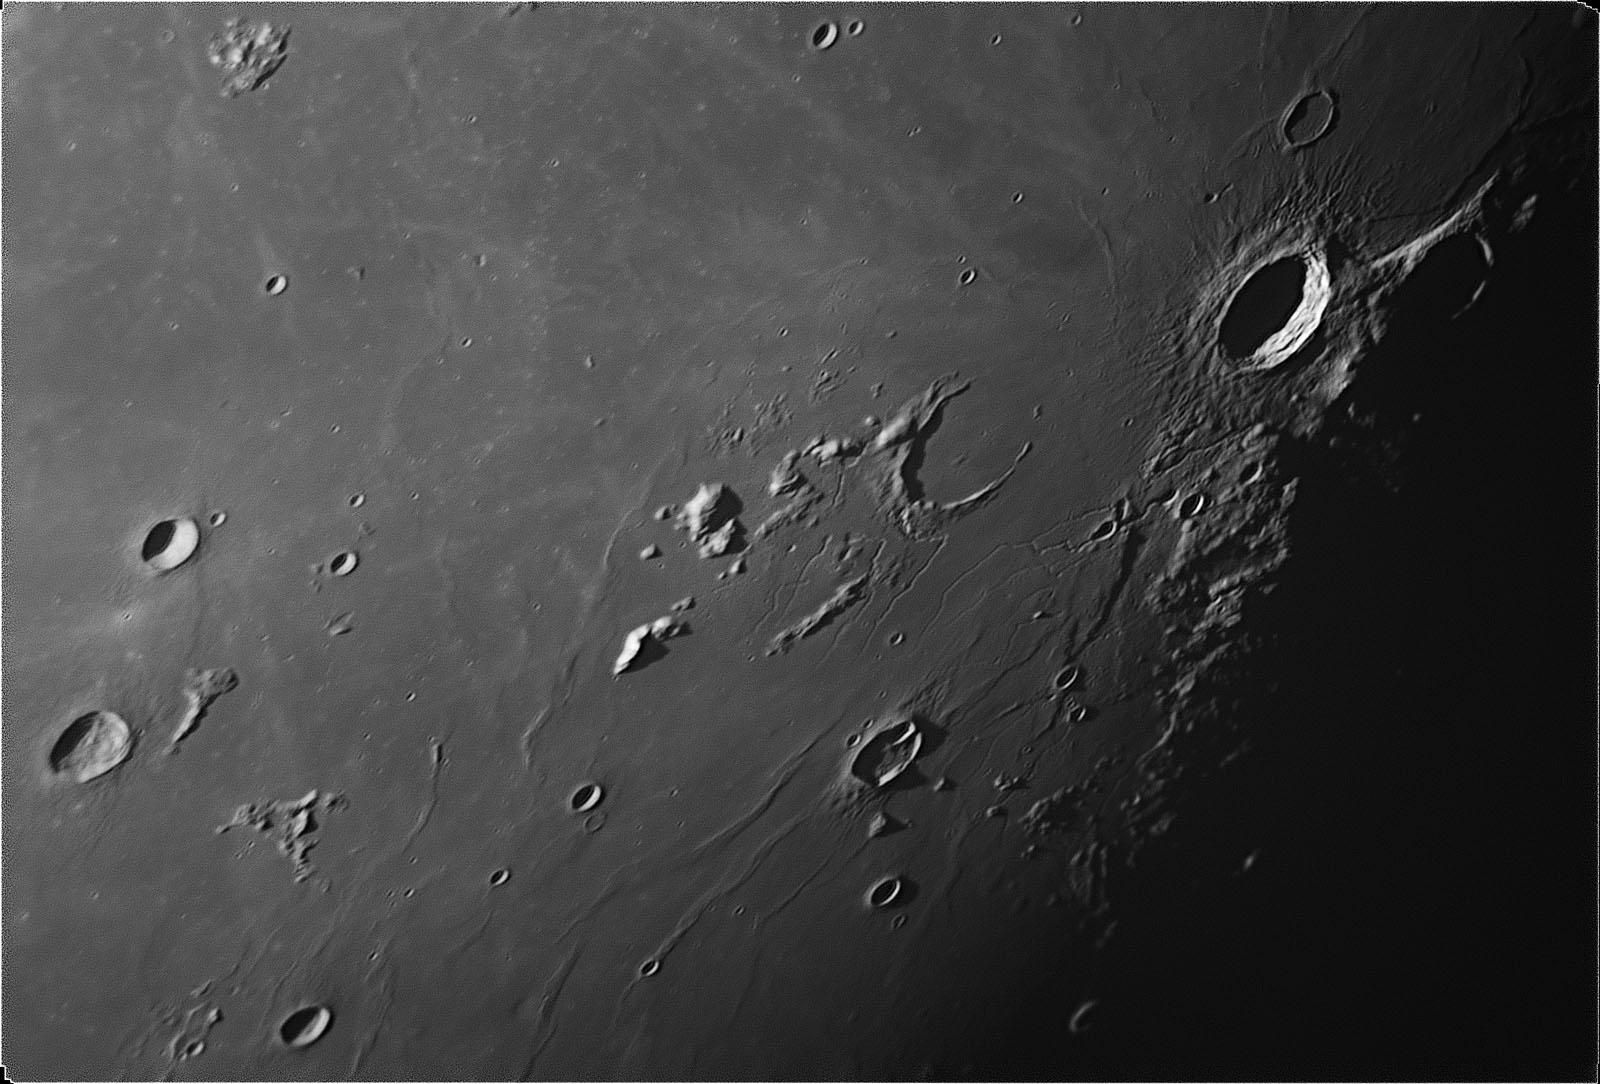 Moon_aristarchus_2016_05_18_w1600